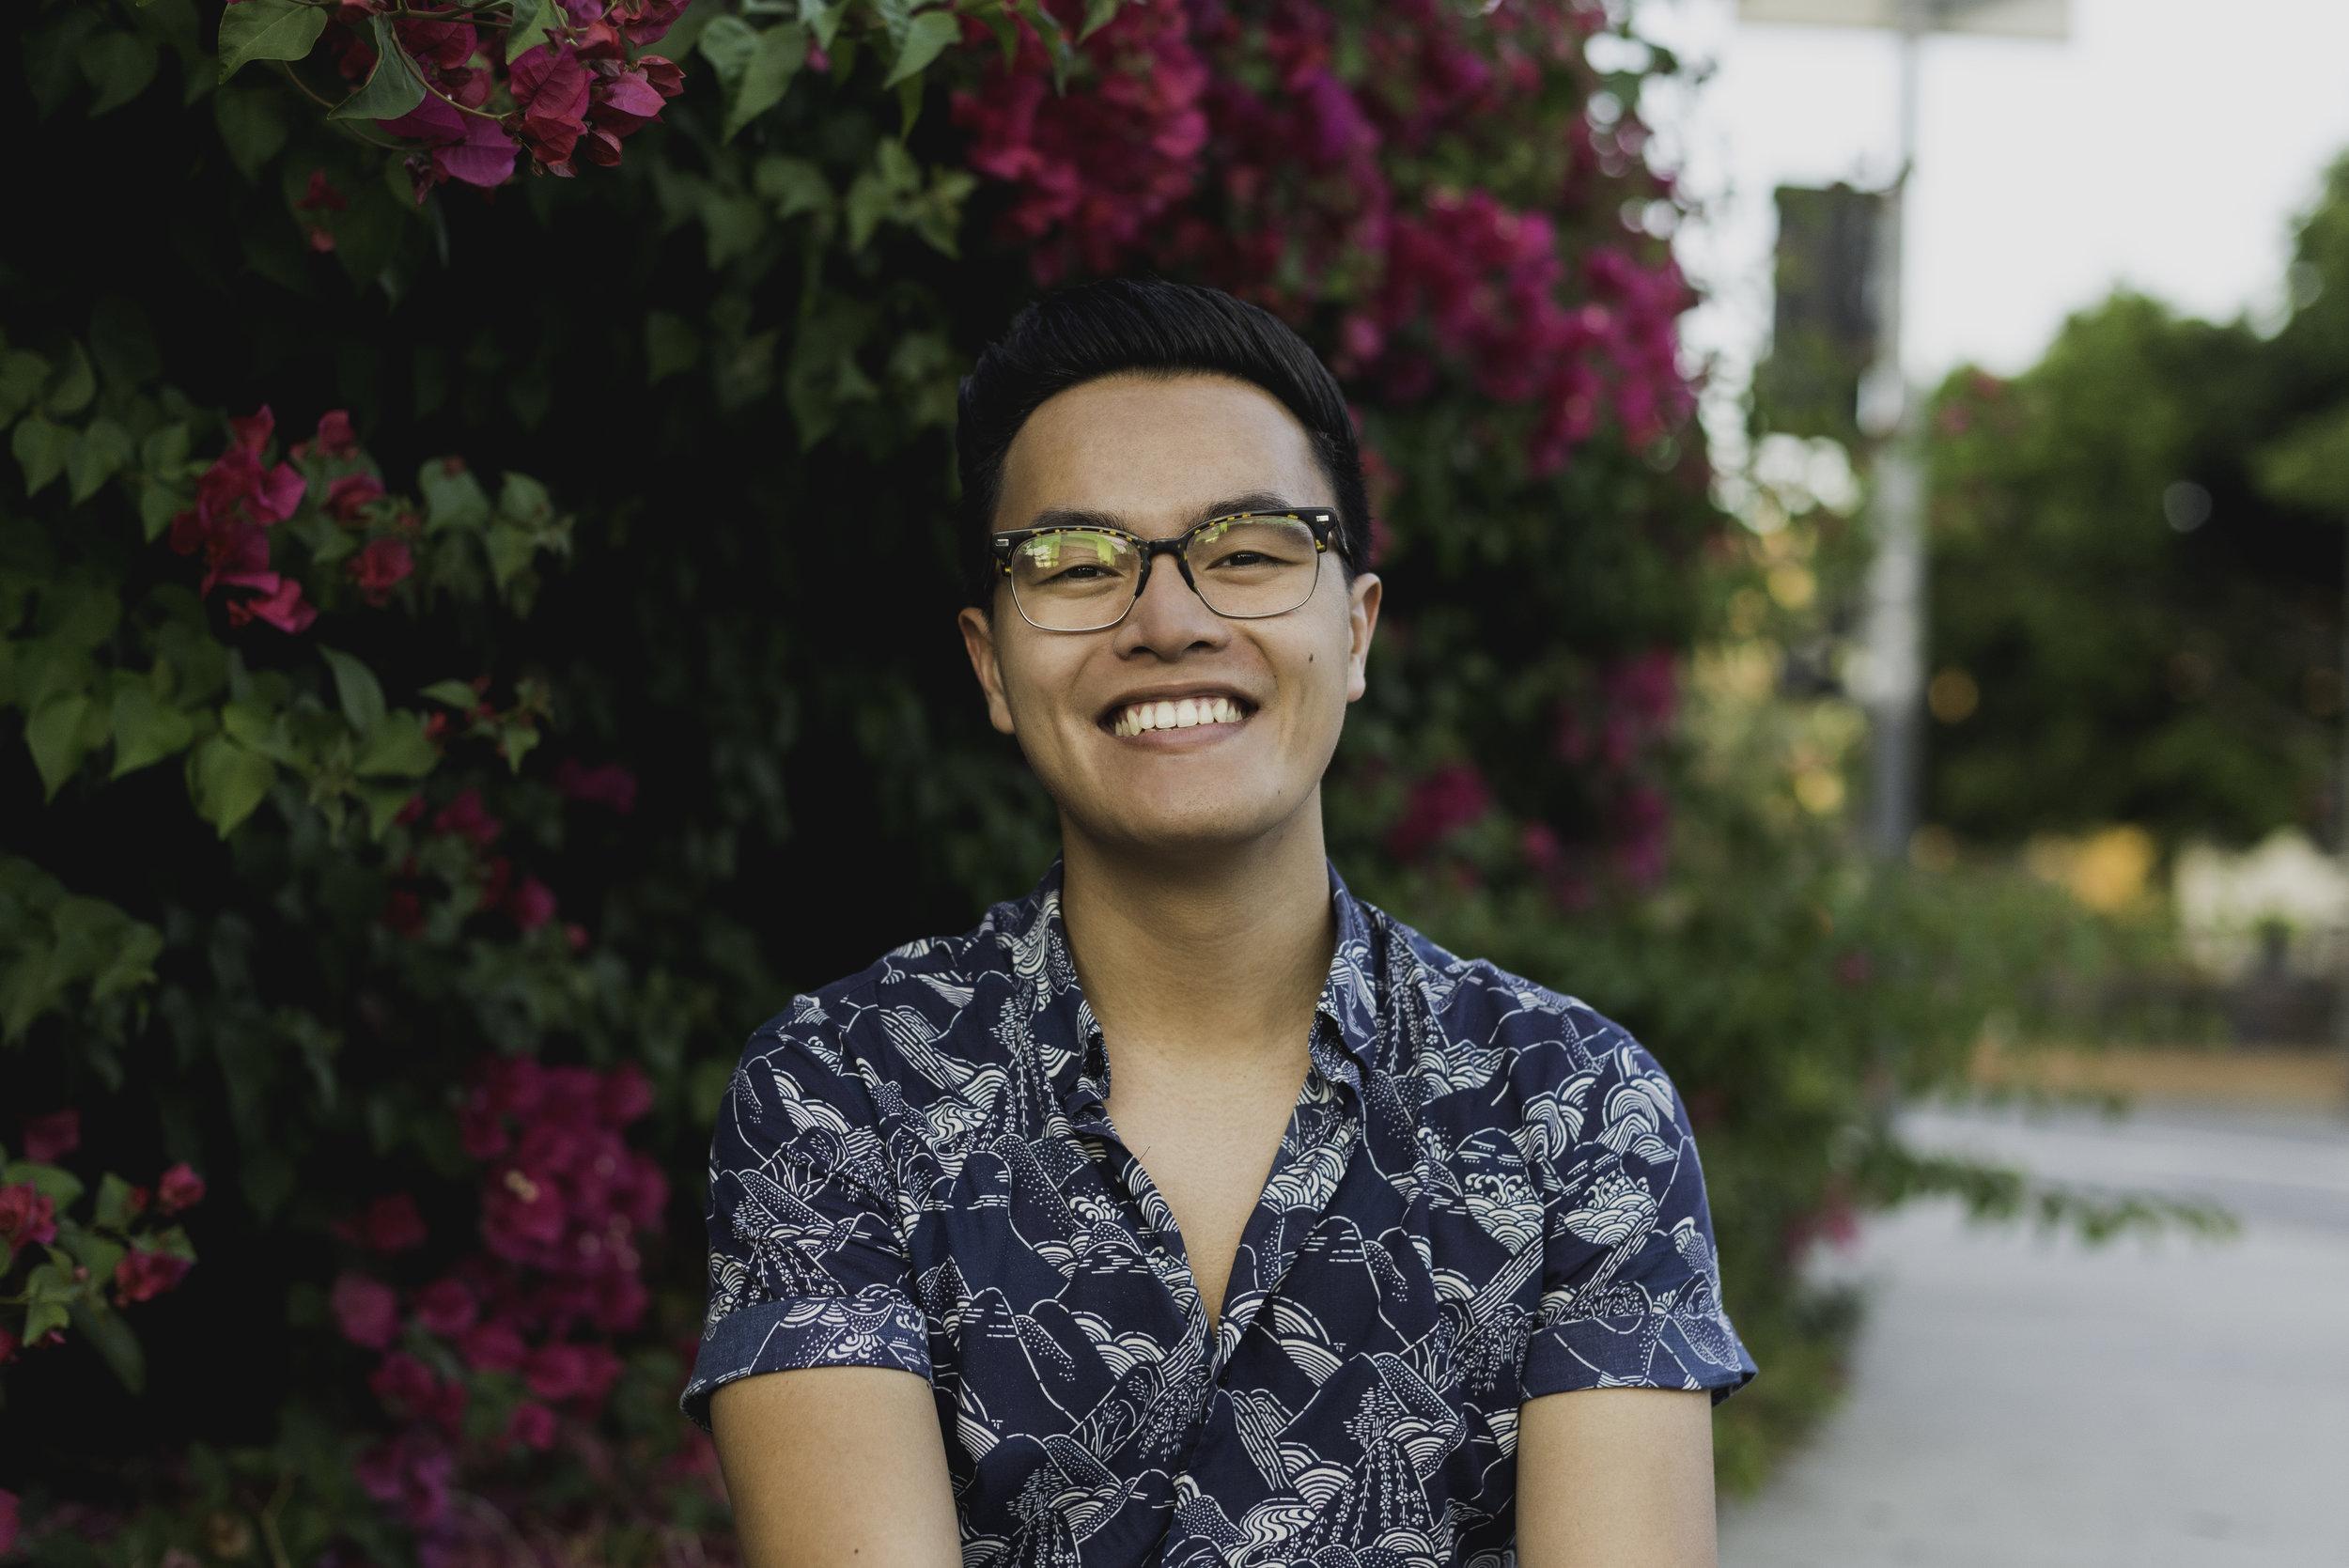 Kevin J. Nguyen Headshot.jpg